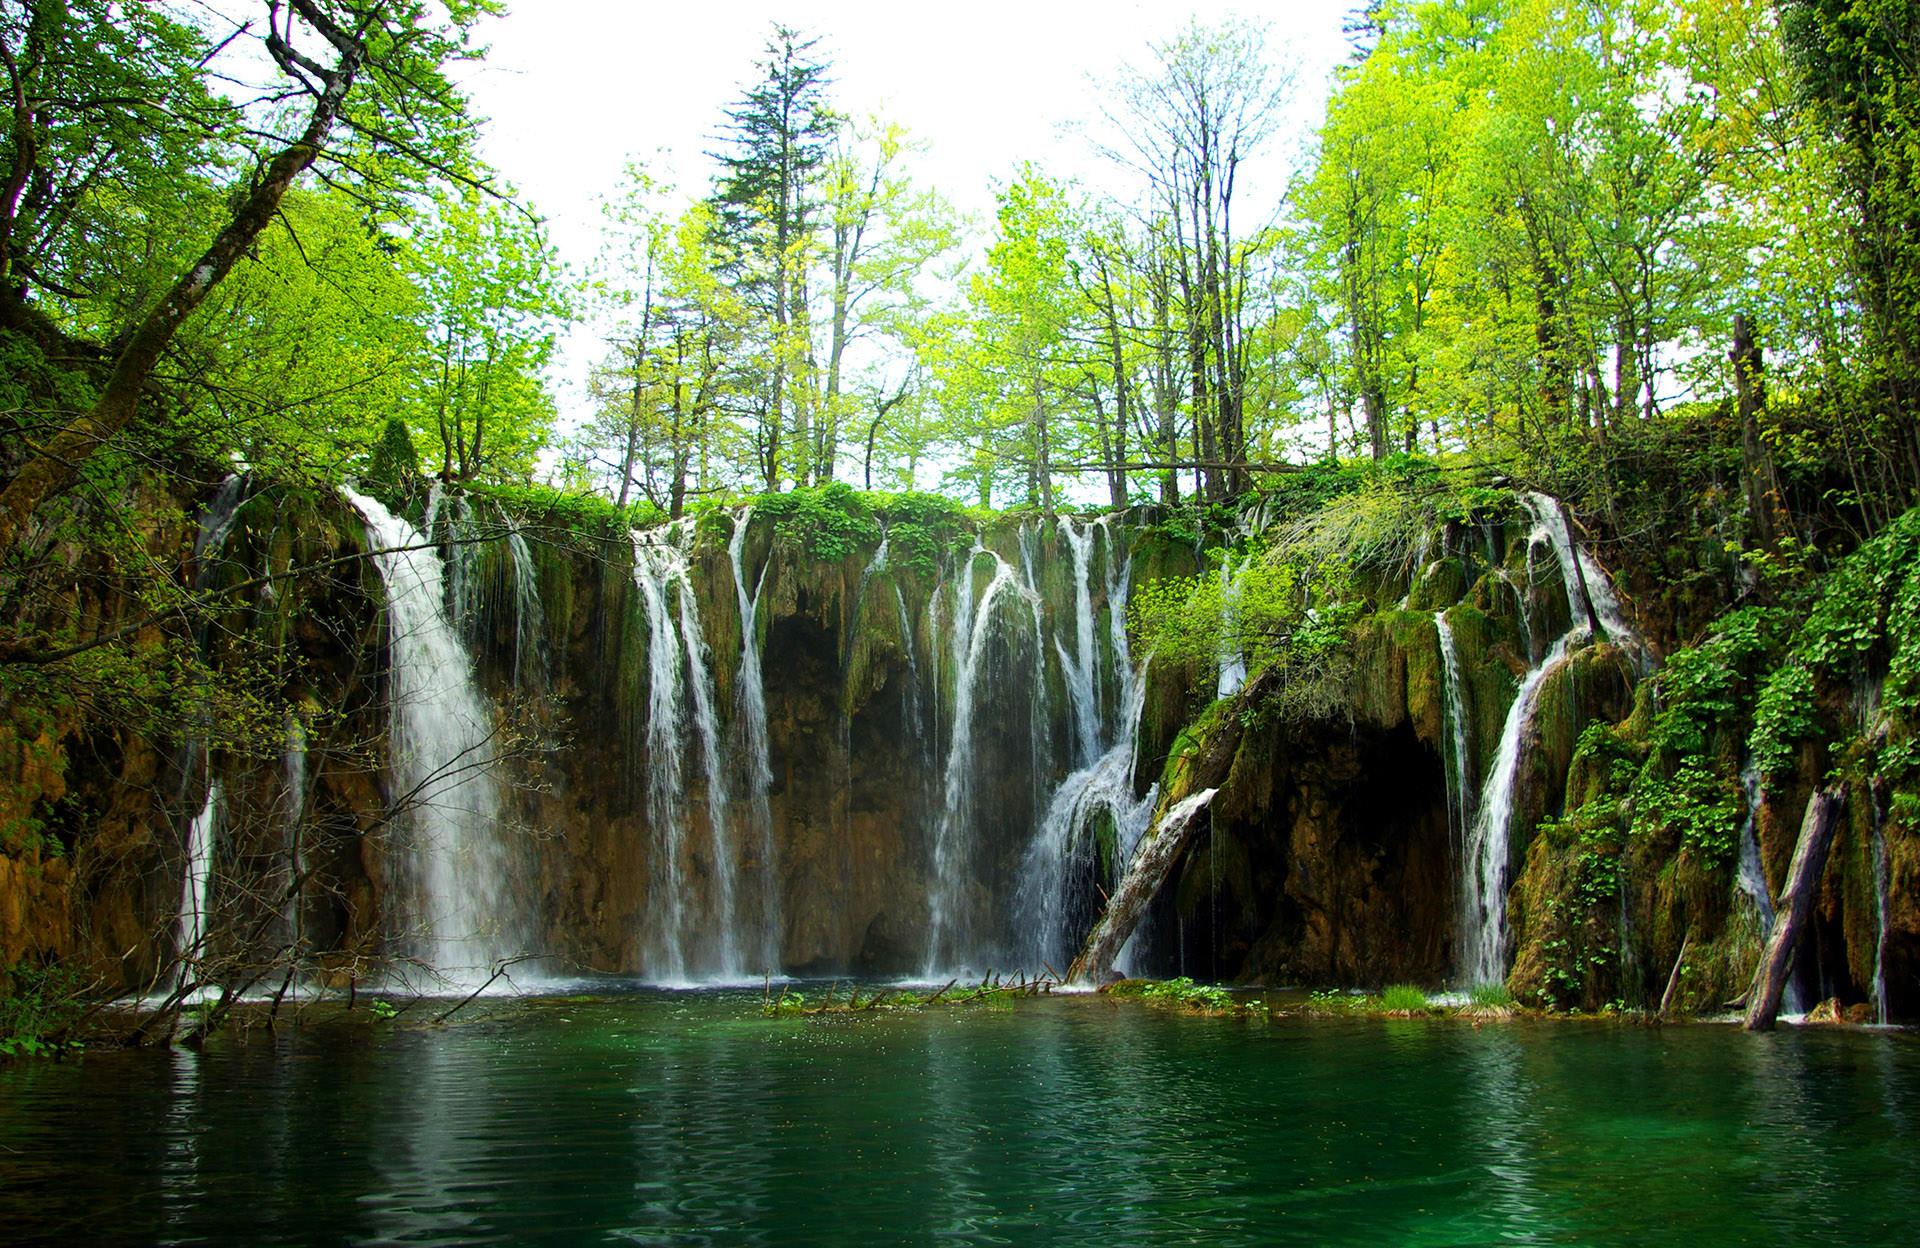 http://euromapa.net/wp-content/uploads/2017/04/plitvice-lakes-national-park-4.jpg